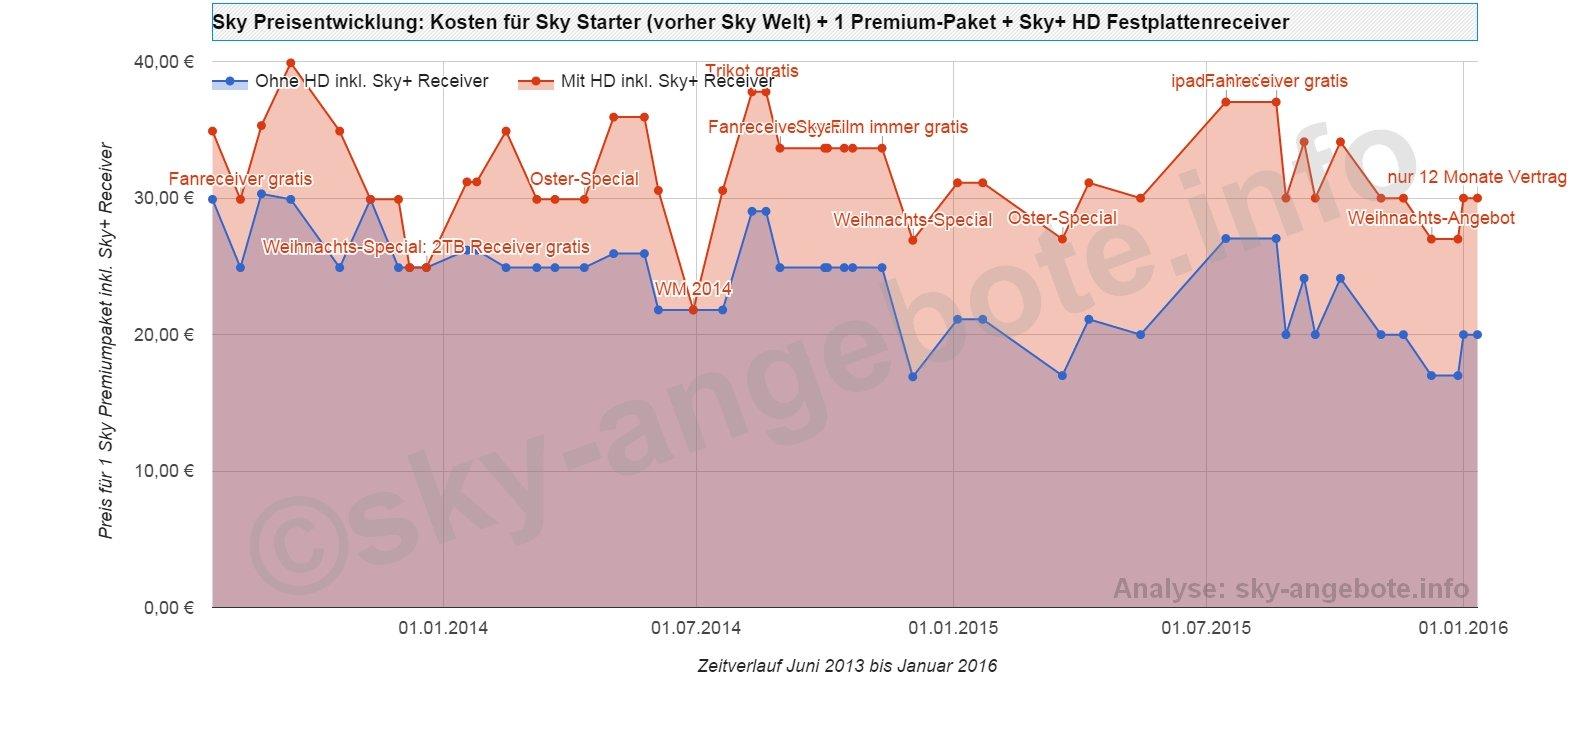 sky-preisentwicklung-2013-2016